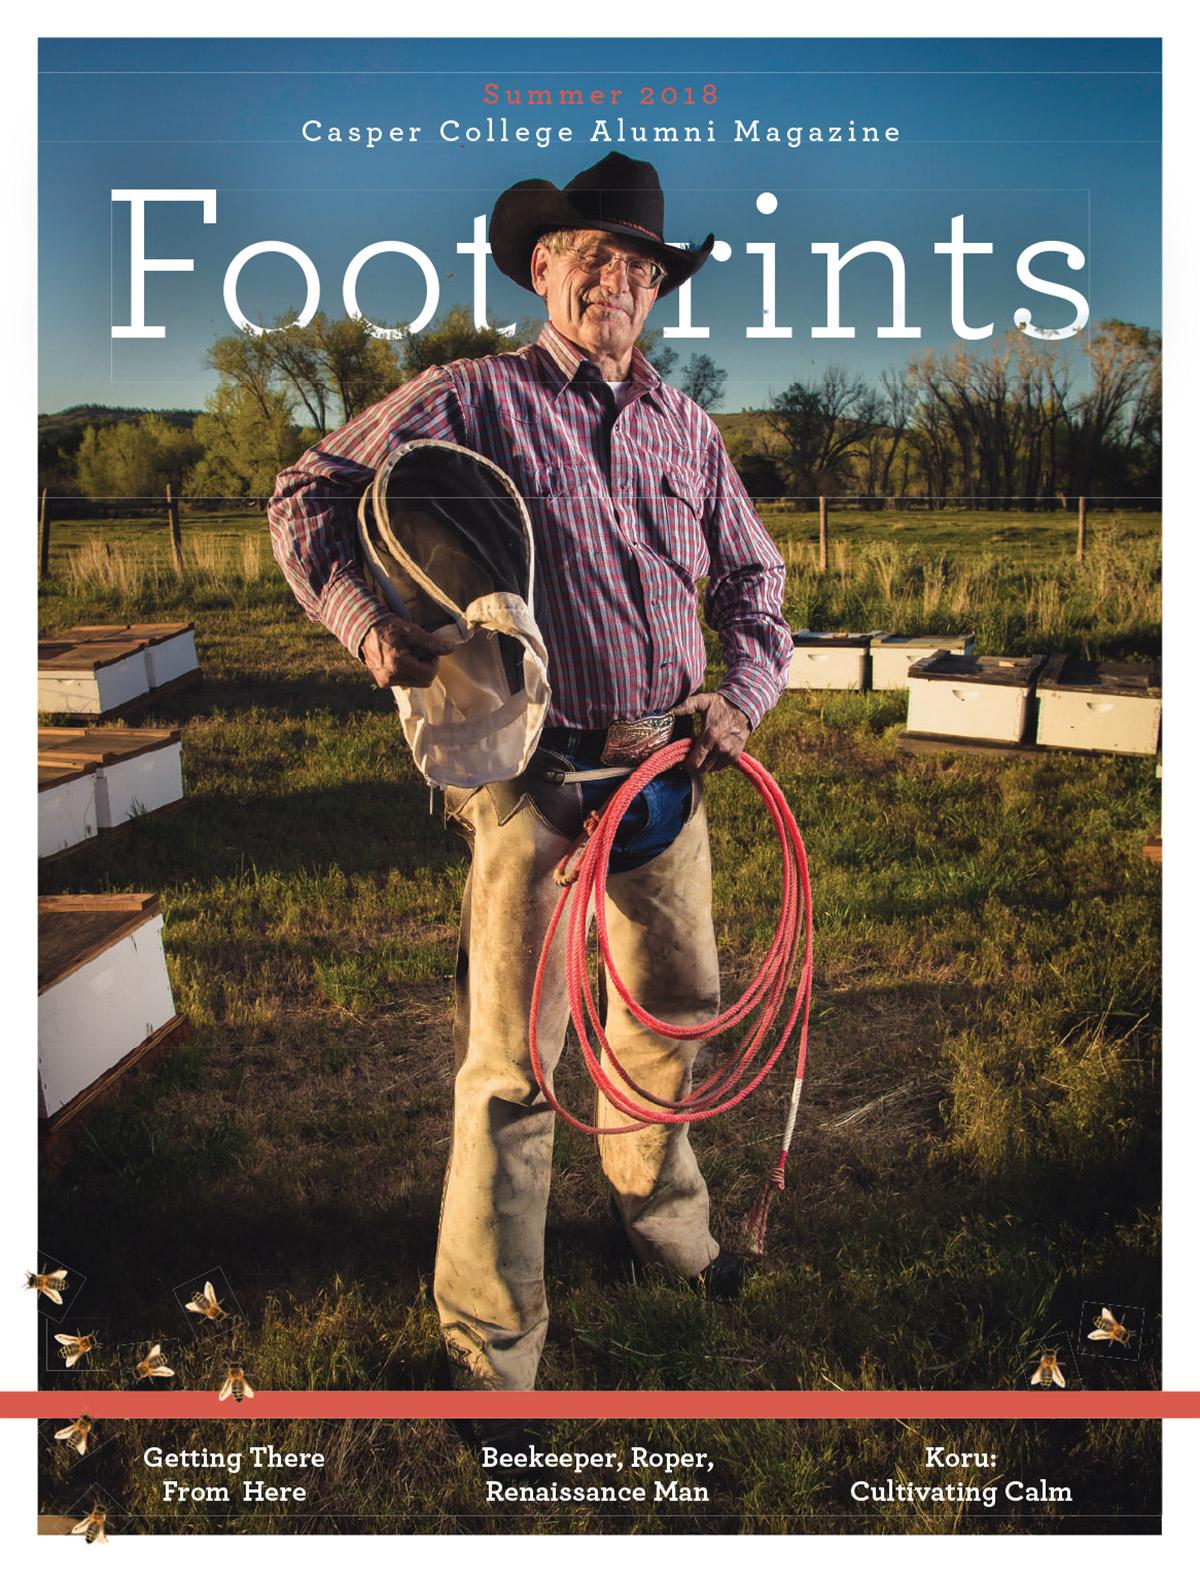 Footprints Magazine - Summer 2018 cover image